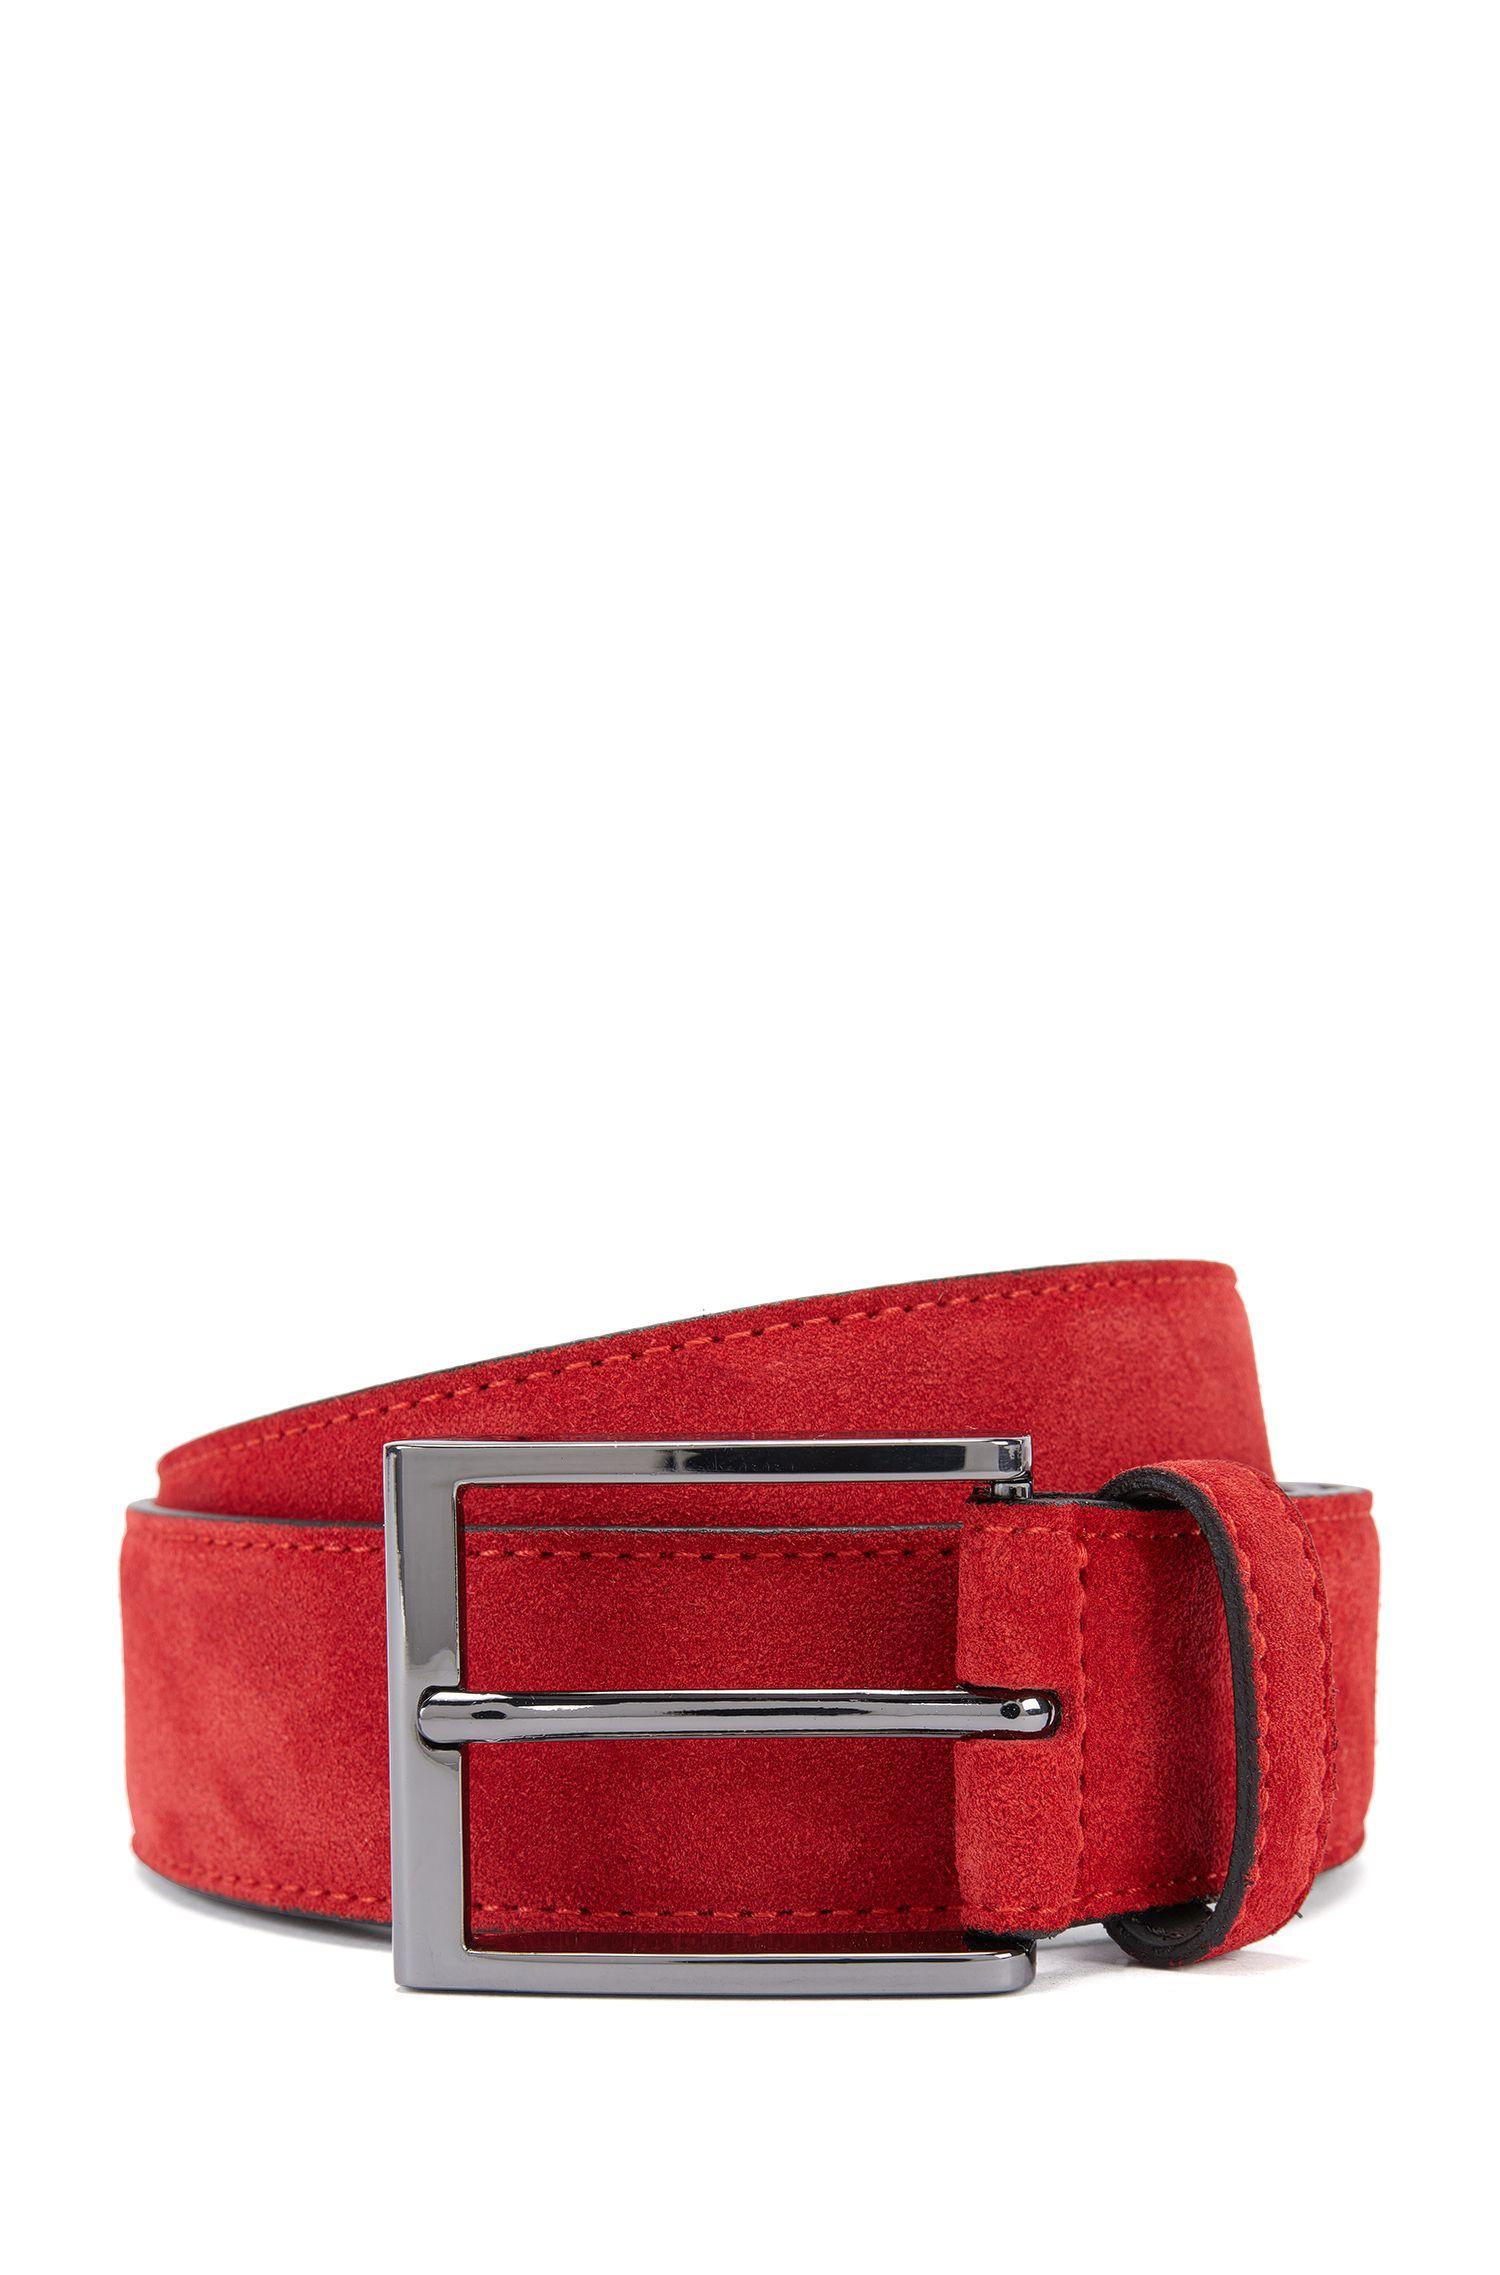 Suede belt with branded metal tip